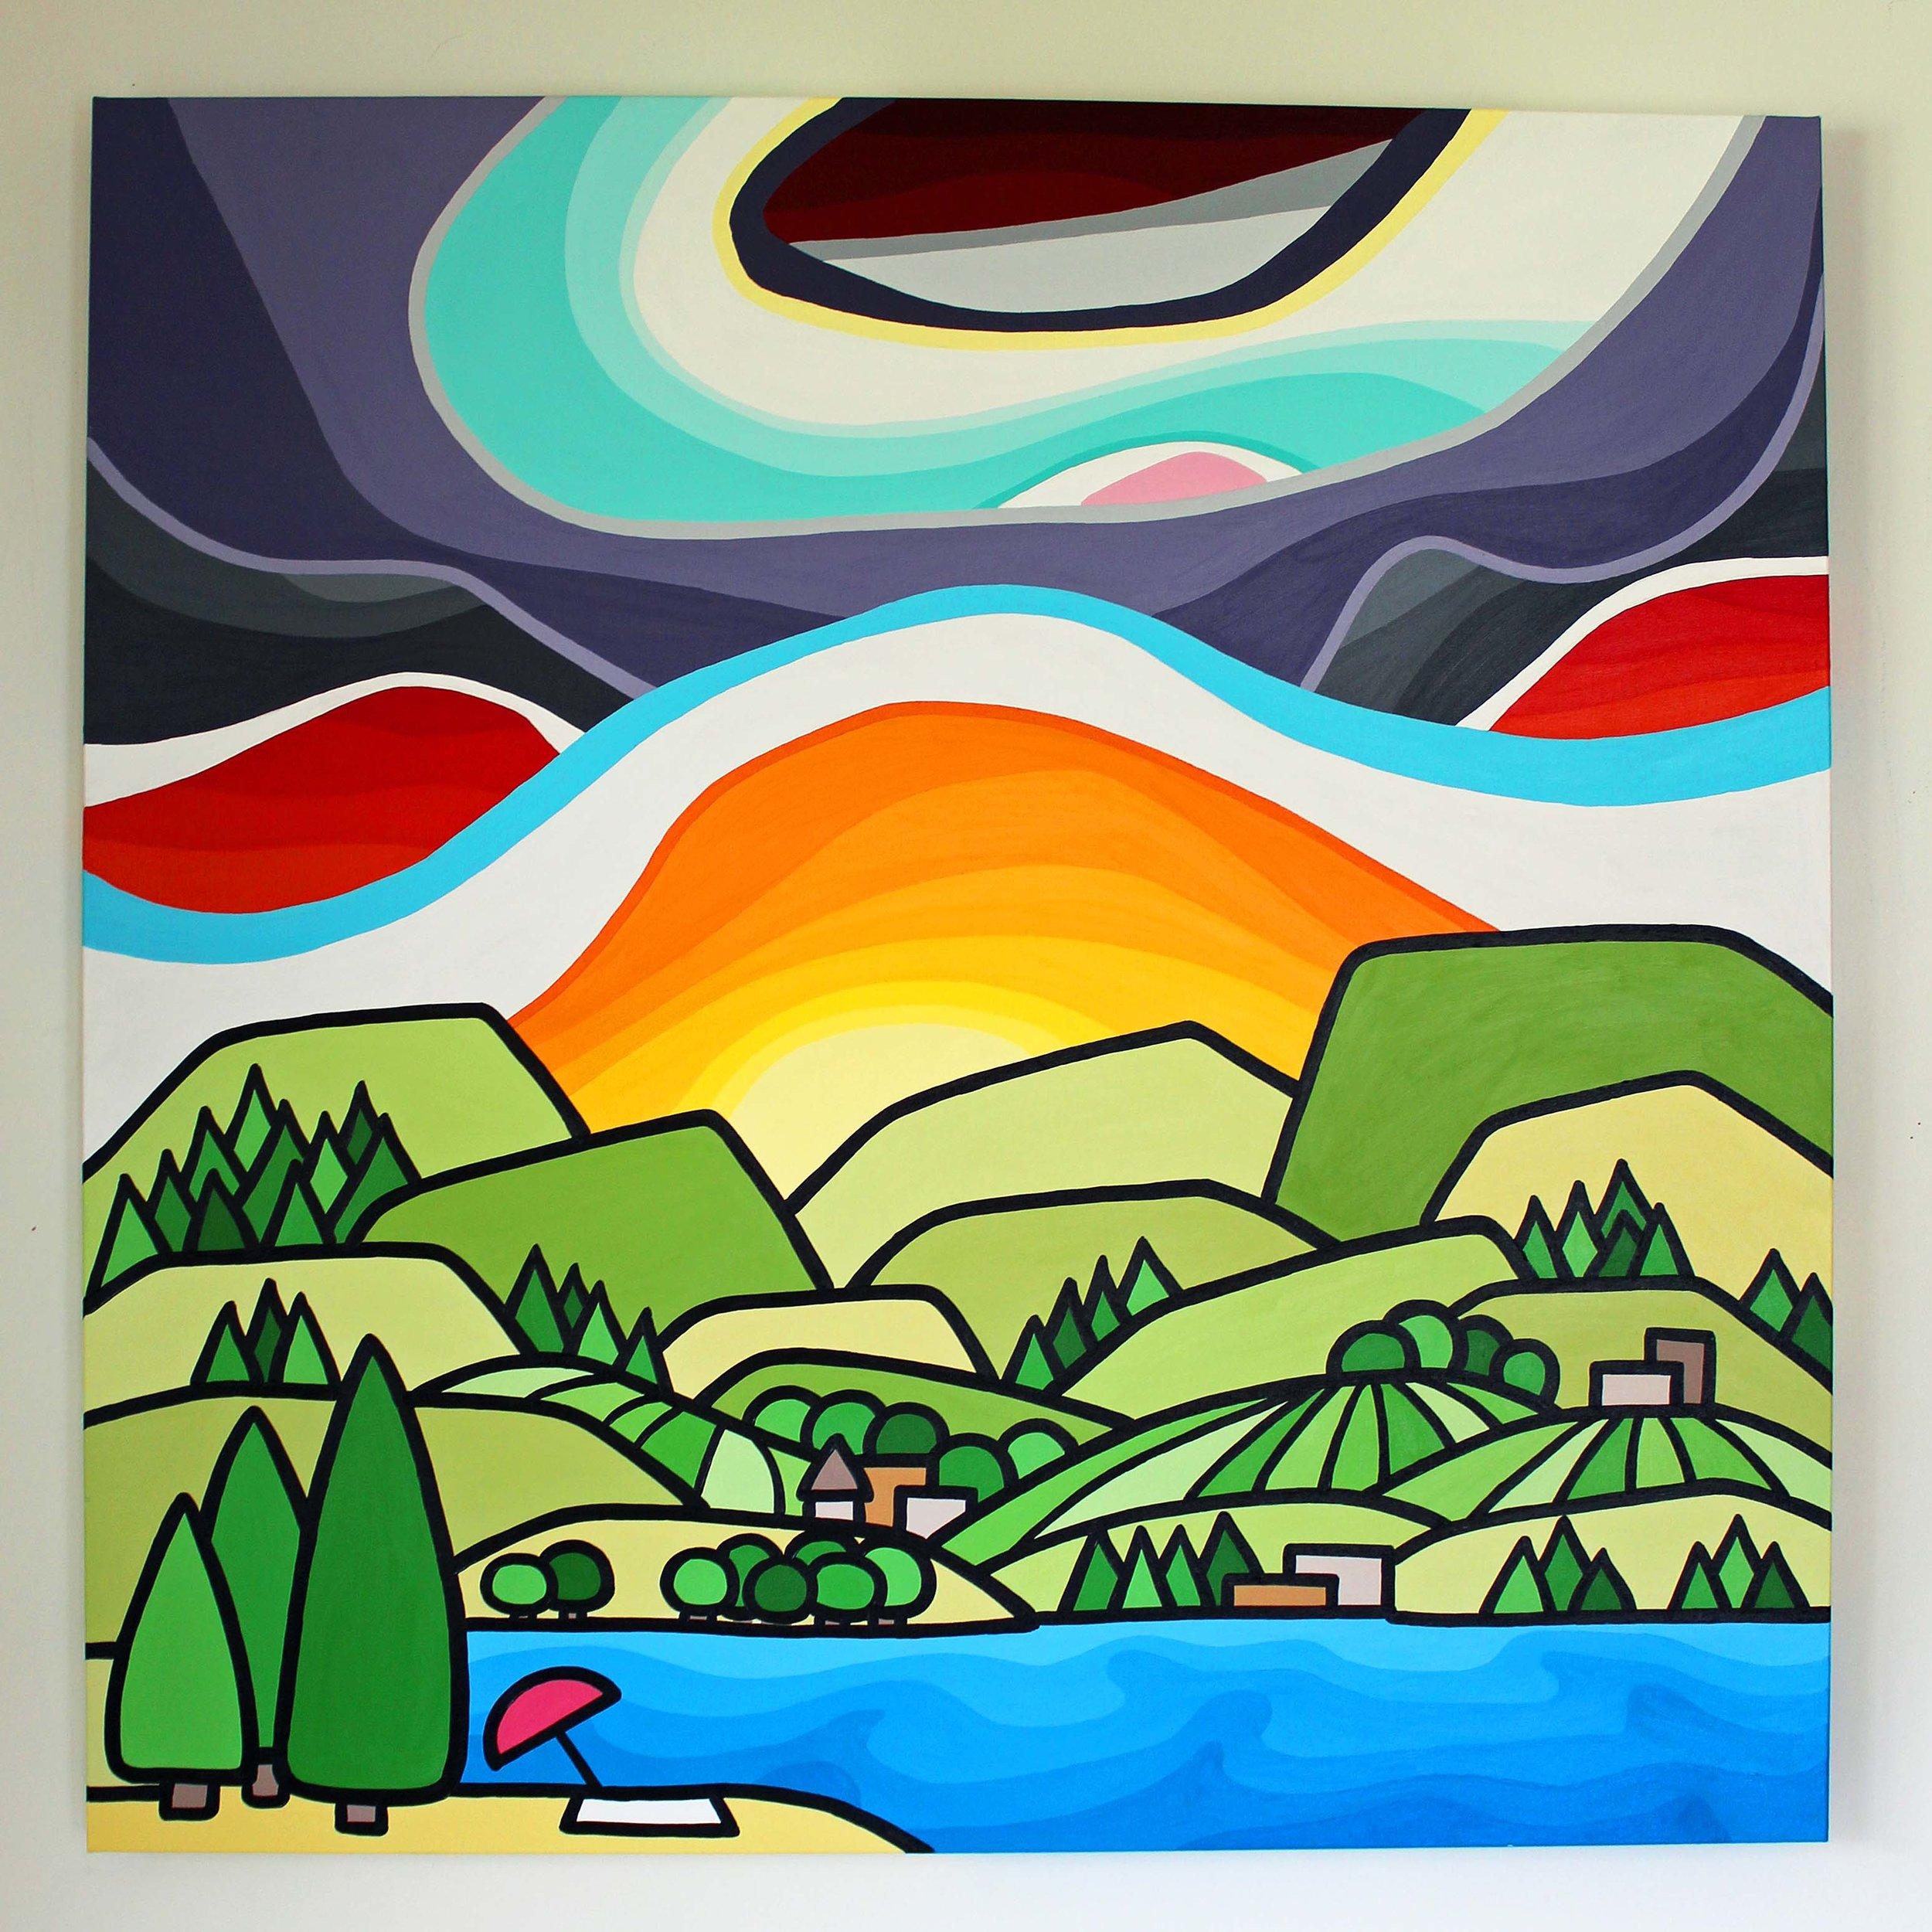 "Okanagan Summer Days - Size: 36"" x 36"" acrylic on canvasPrice: SOLD"